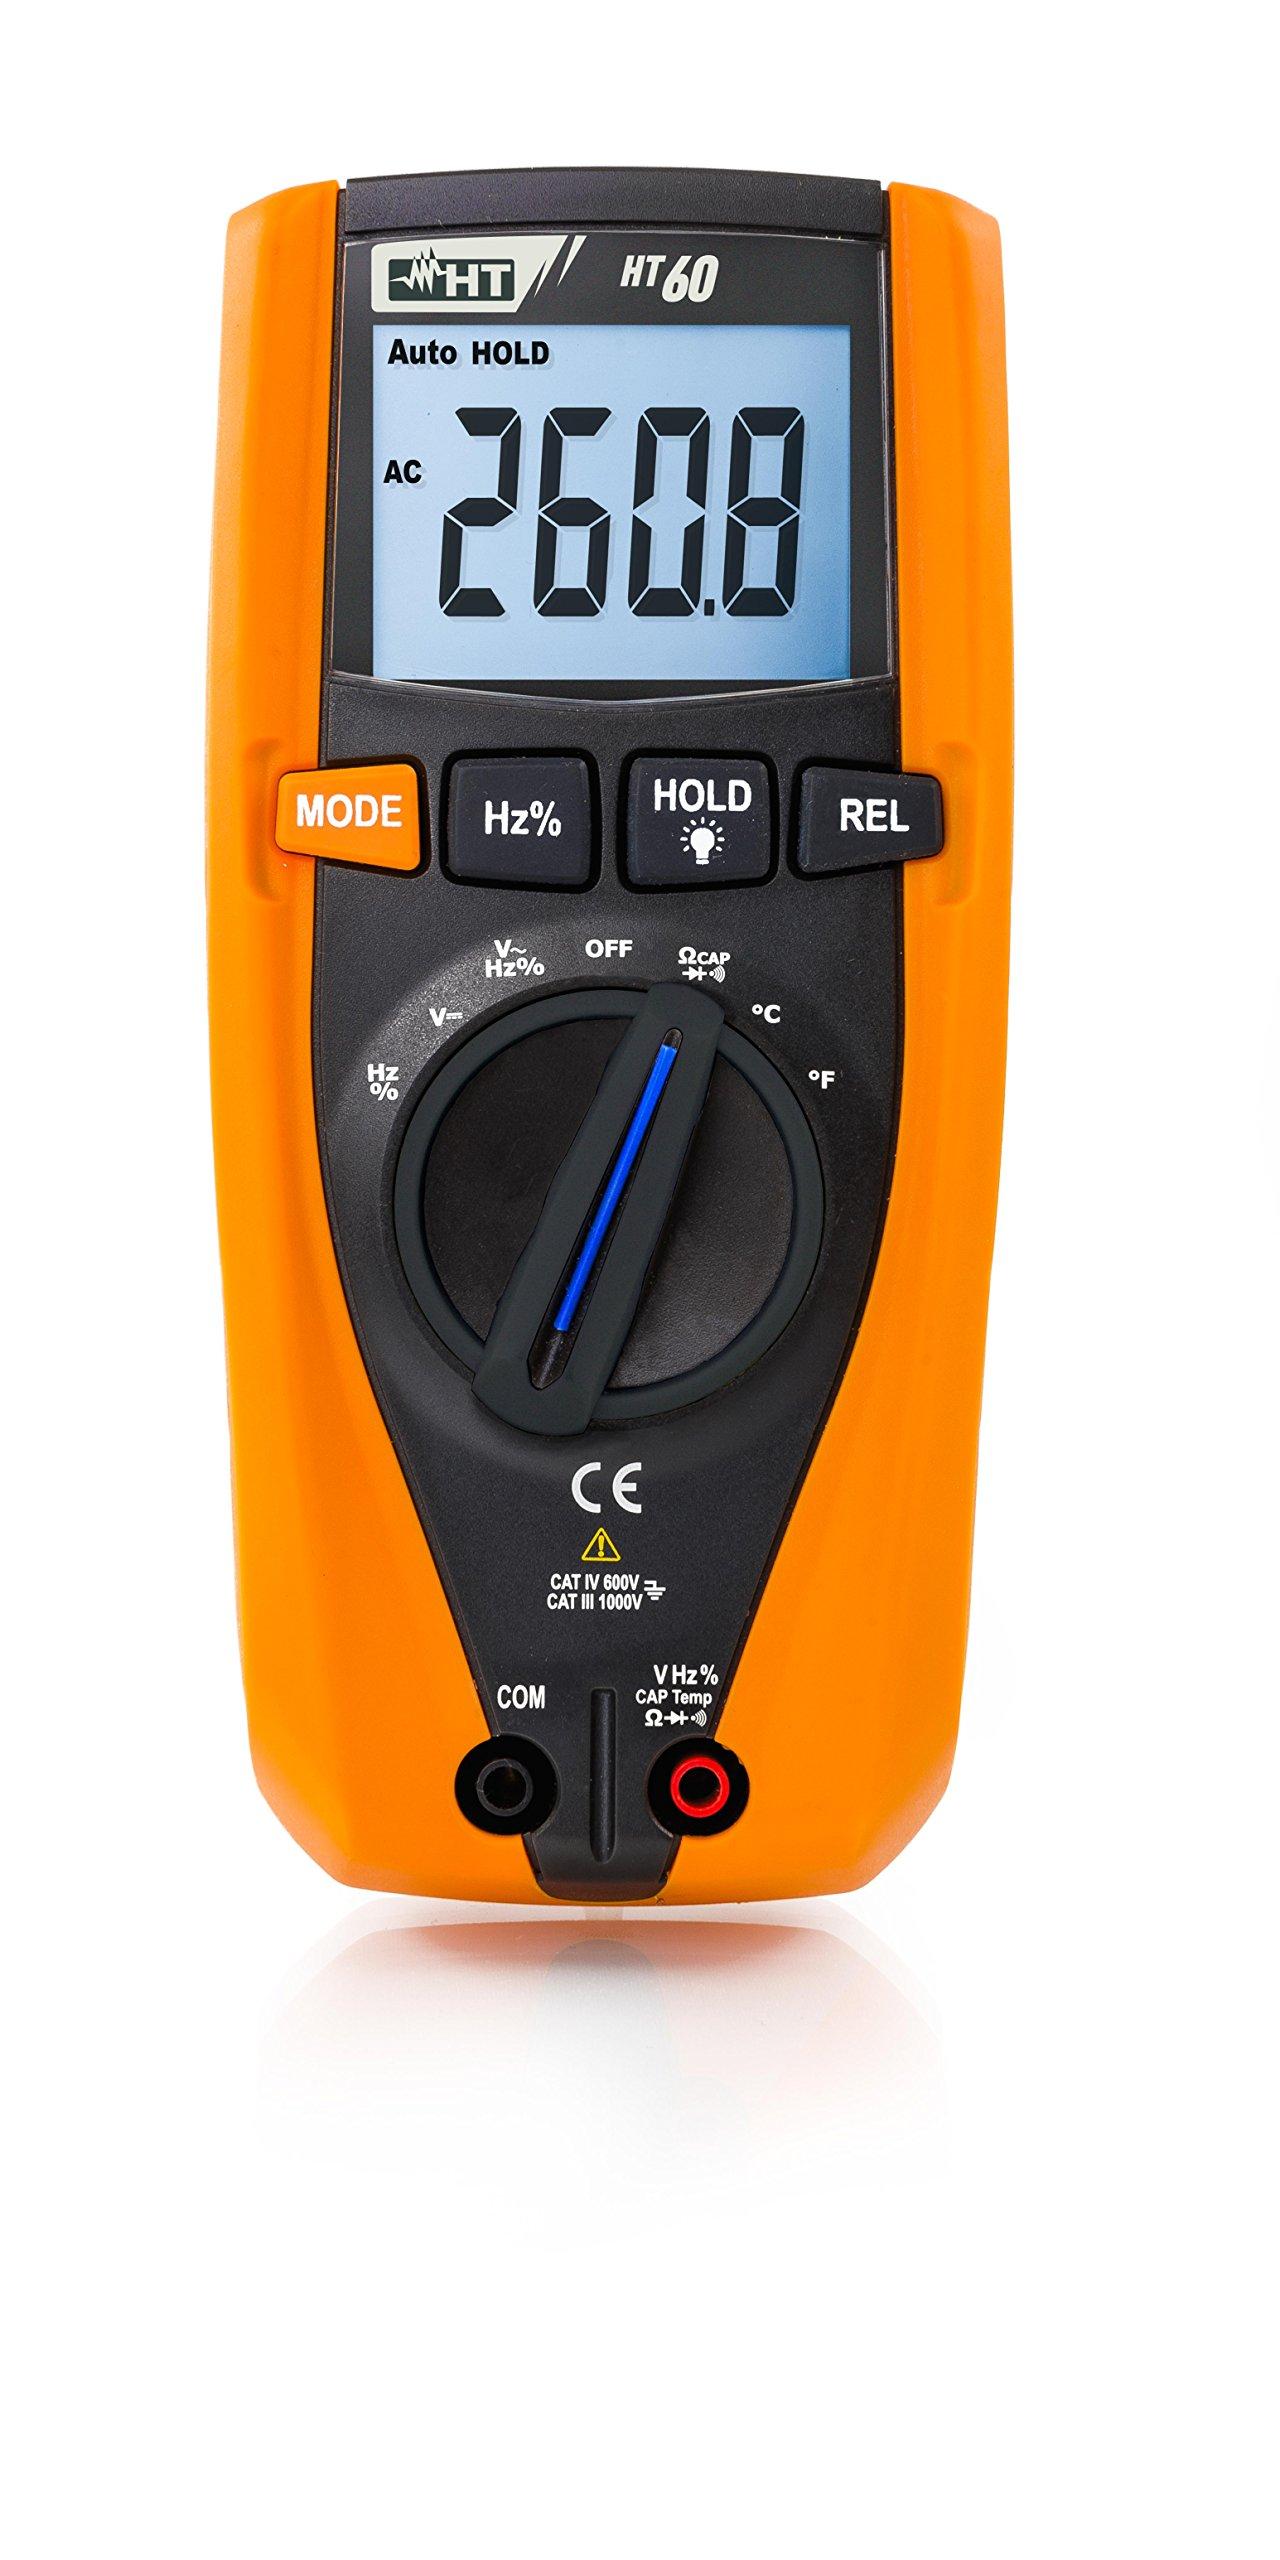 HT Instruments HT60 Multimeters - Type: Digital, Style: Hand-Held